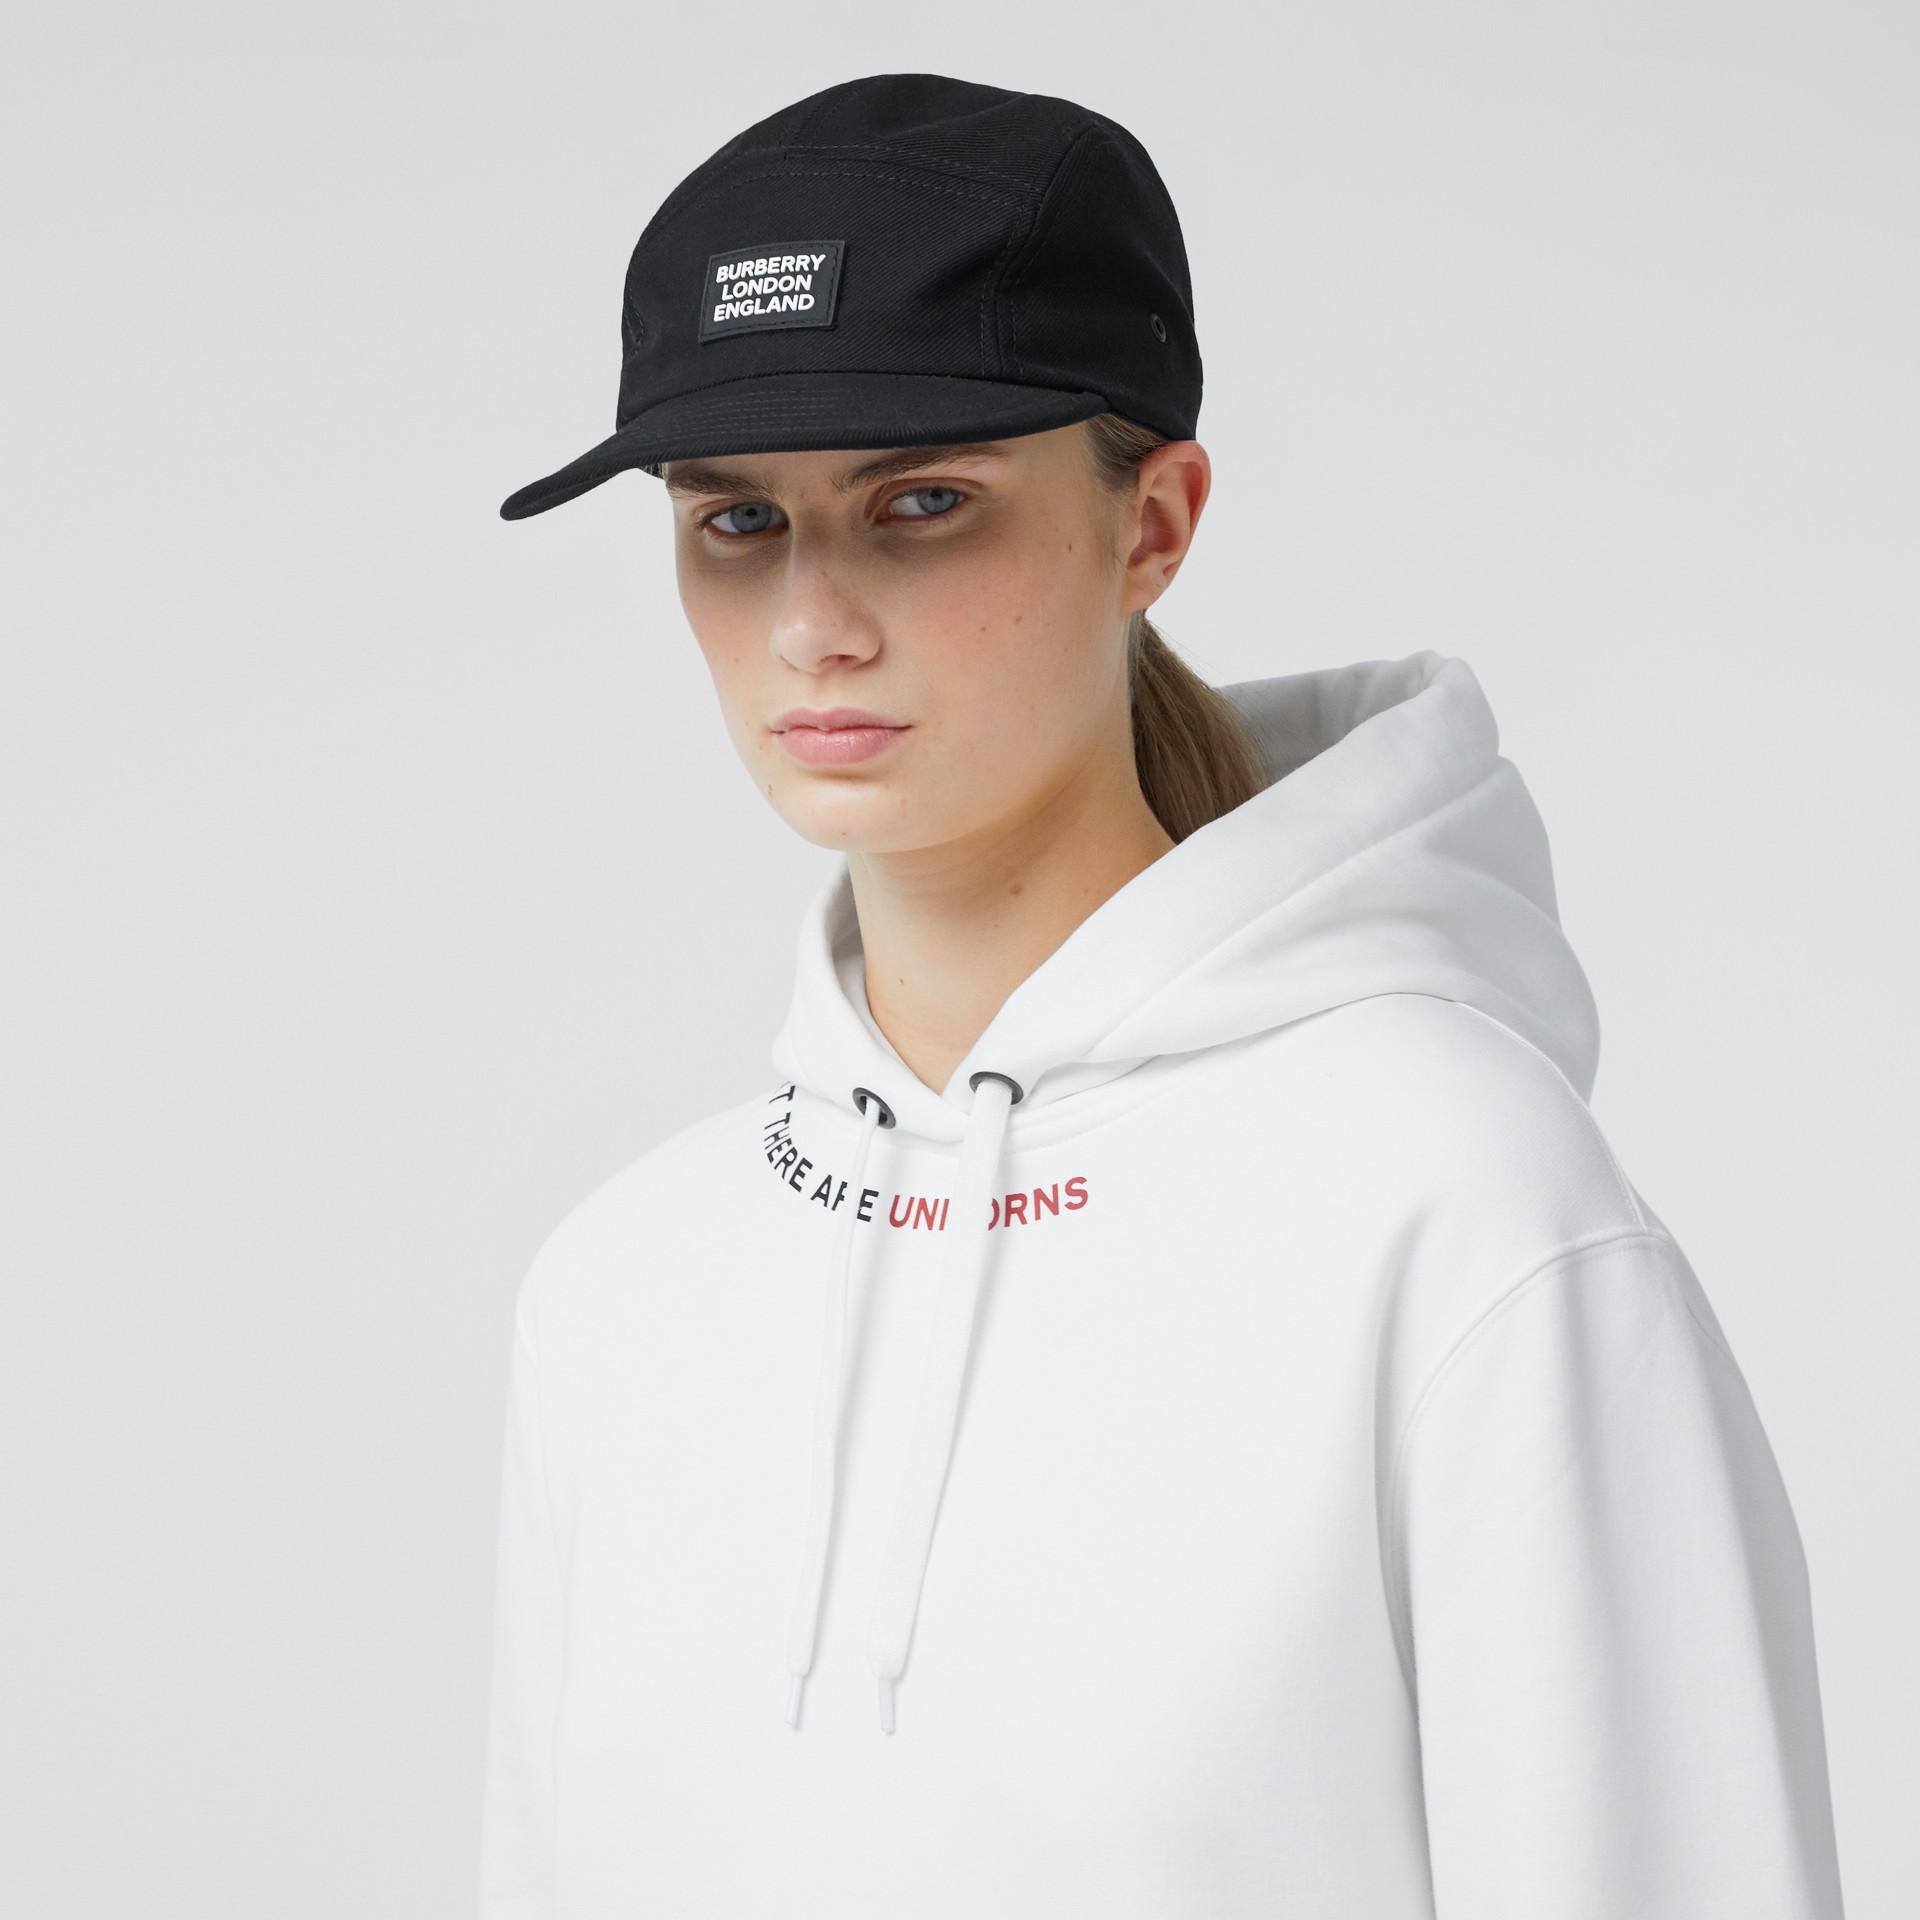 Logo Appliqué Cotton Twill Cap in Black | Burberry United States - gallery image 2